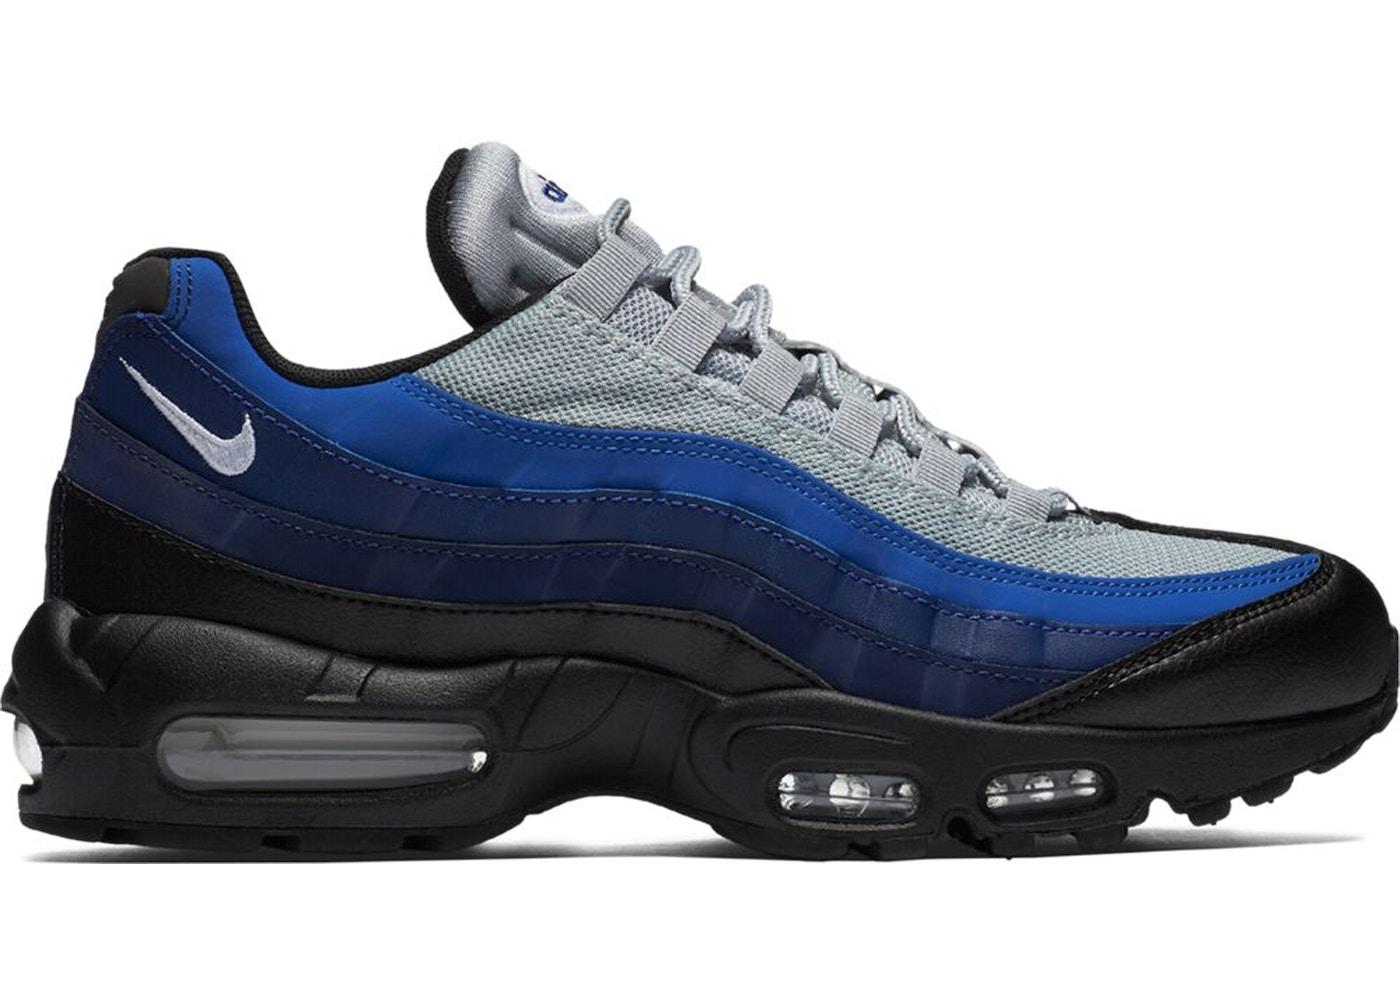 nike air max 95 grey black blue